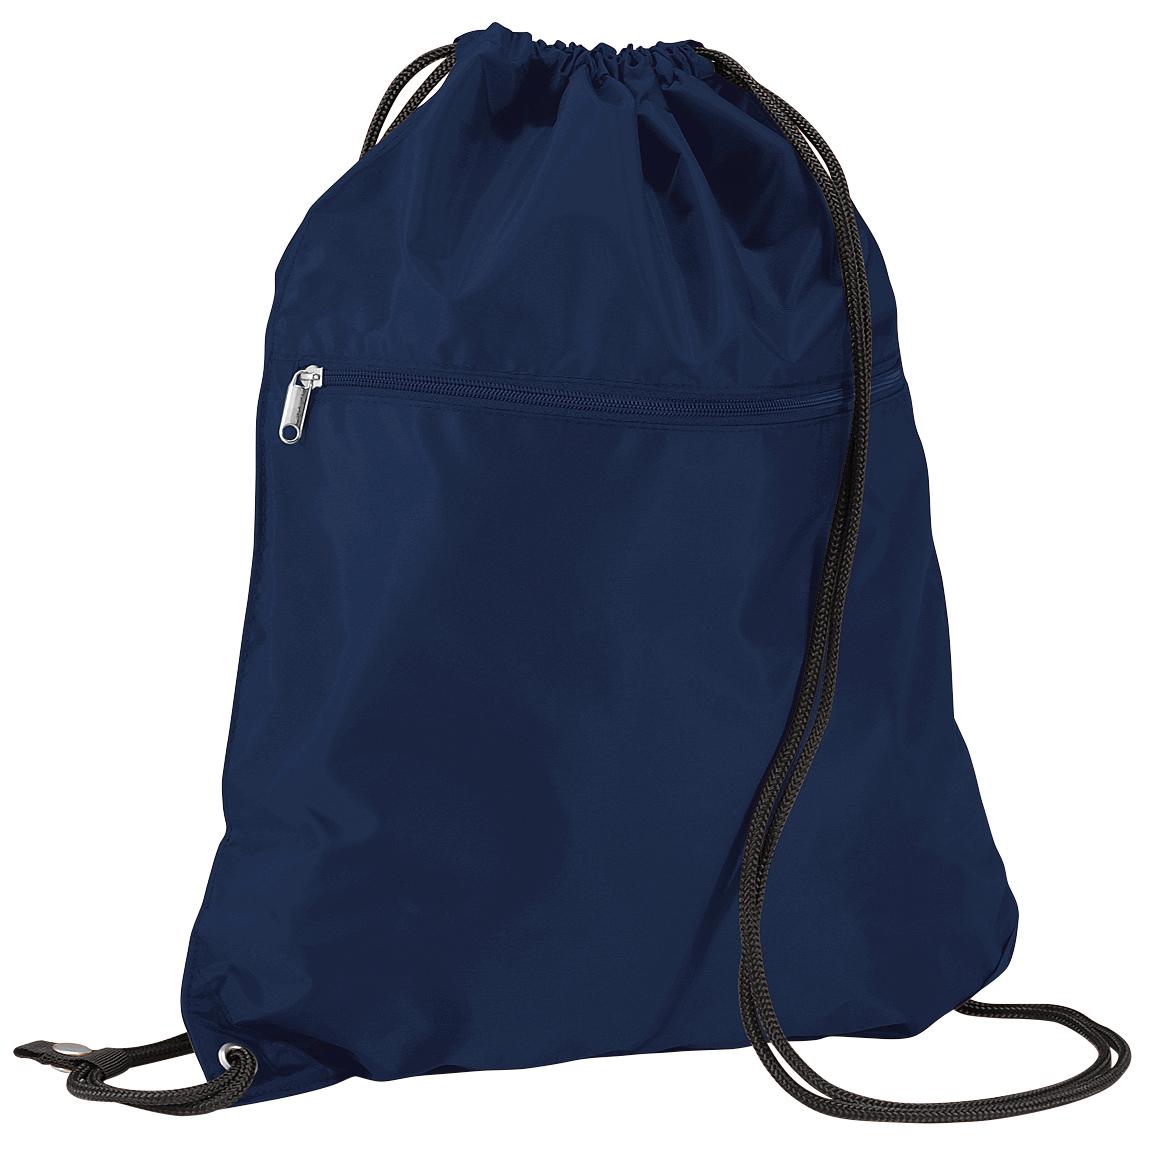 Quadra Premium Gymsac Over Shoulder Bag - 14 Litres (One Size) (French Navy)